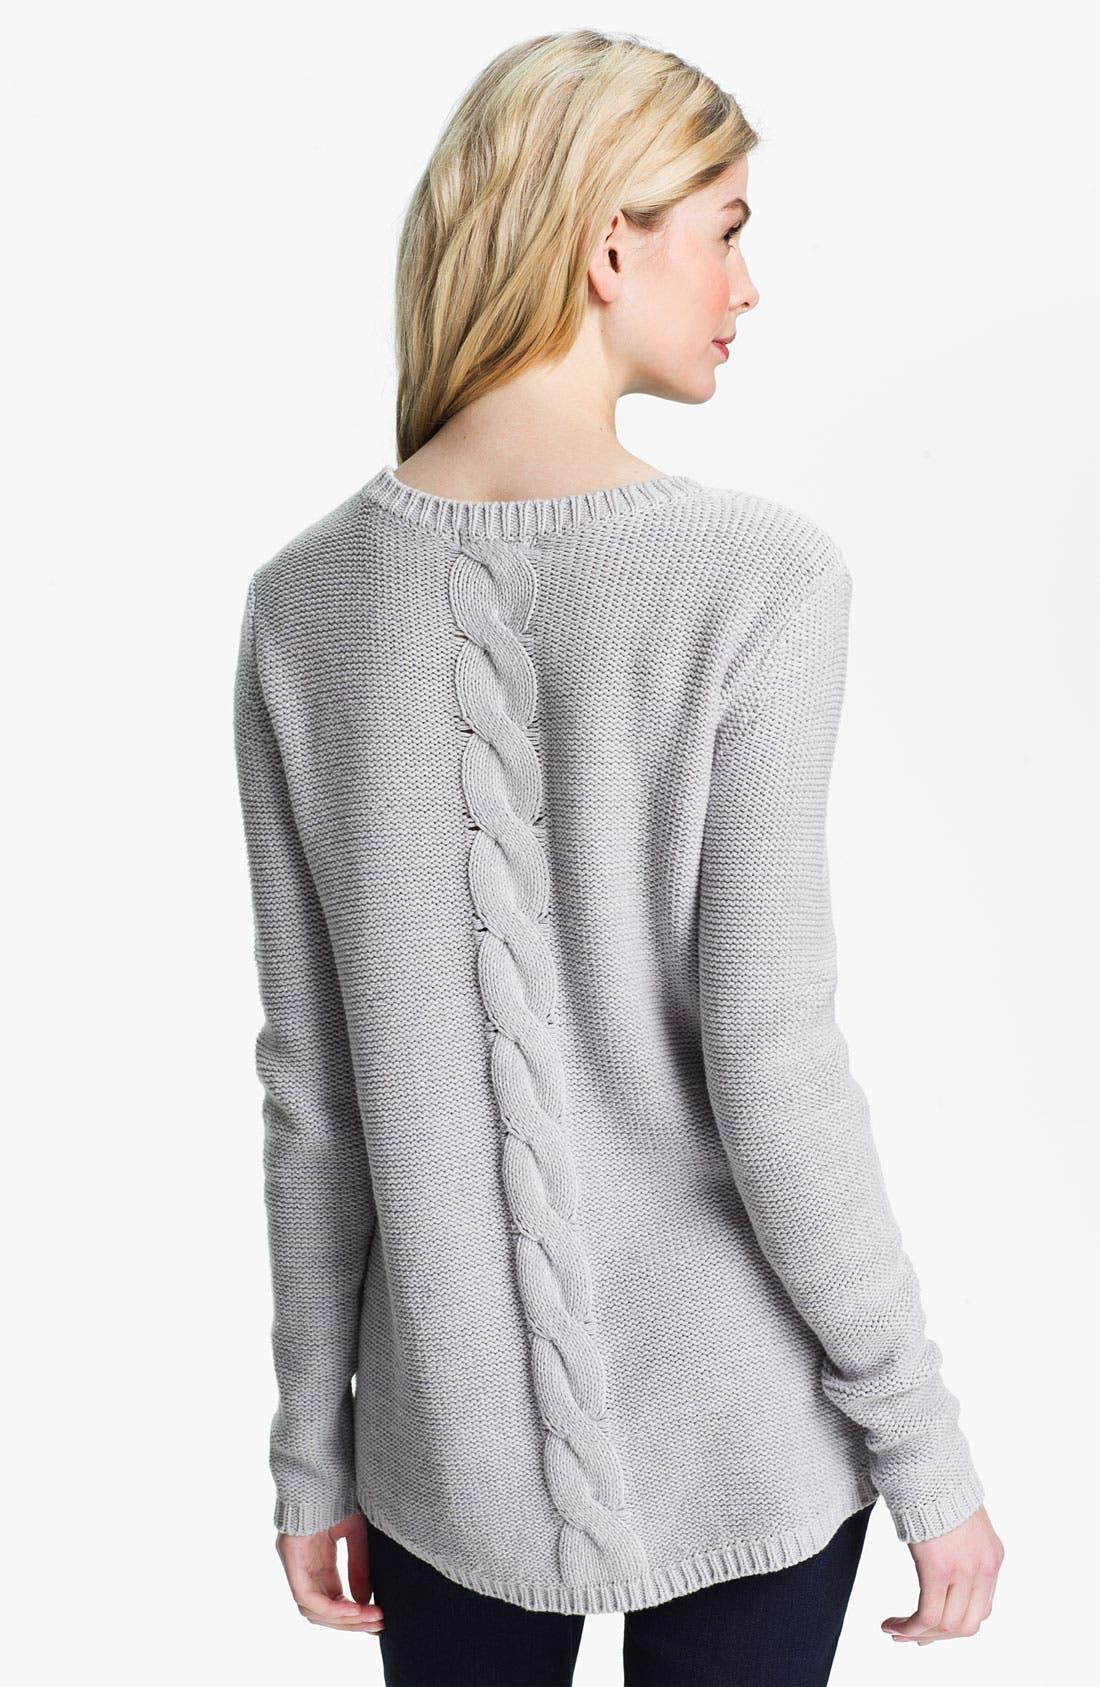 Alternate Image 1 Selected - Isaac Mizrahi Jeans 'Felicity' Sweater (Online Exclusive)